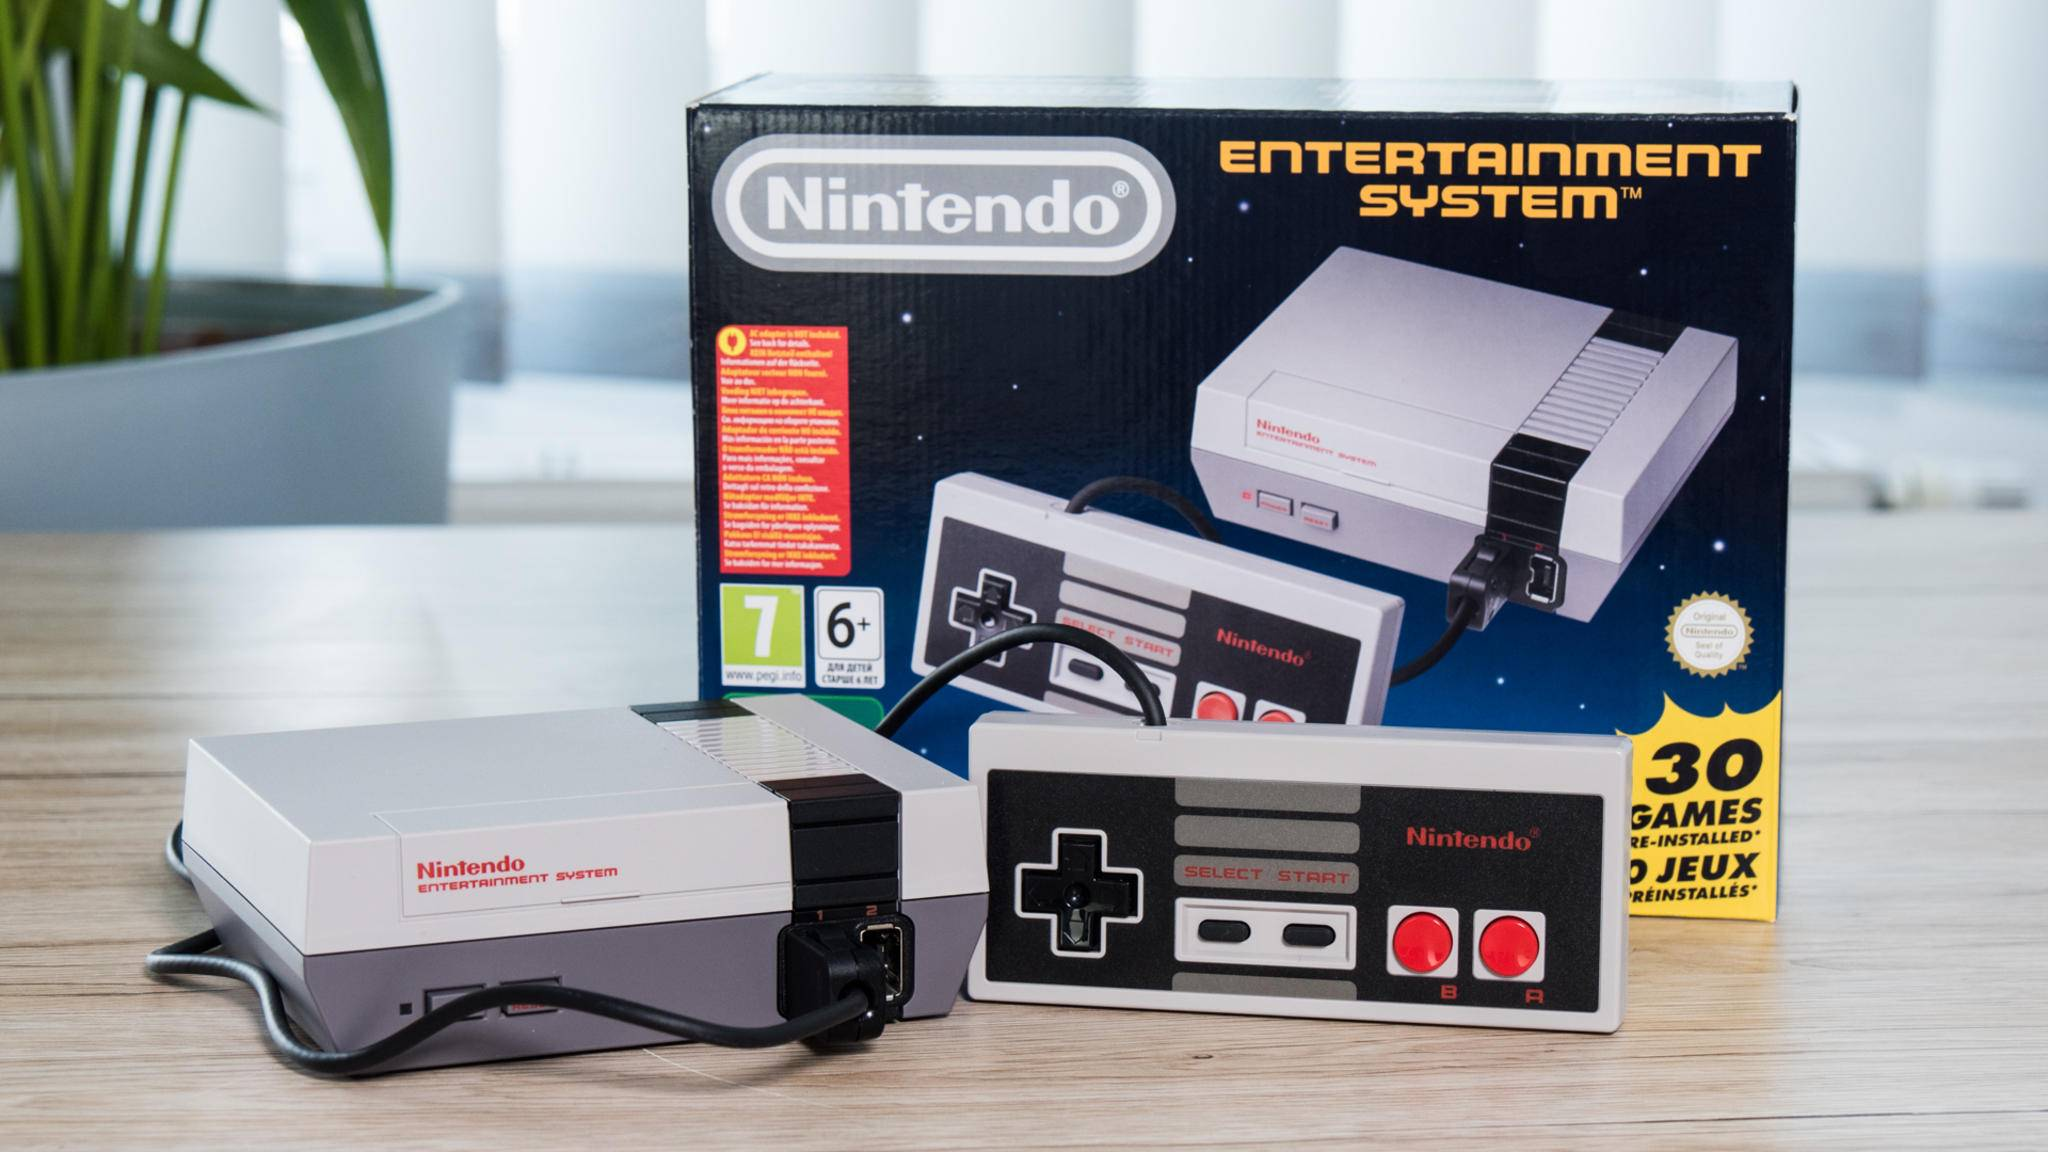 Das NES Classic Mini dürfte bald zum echten Topseller bei Versteigerungen werden.